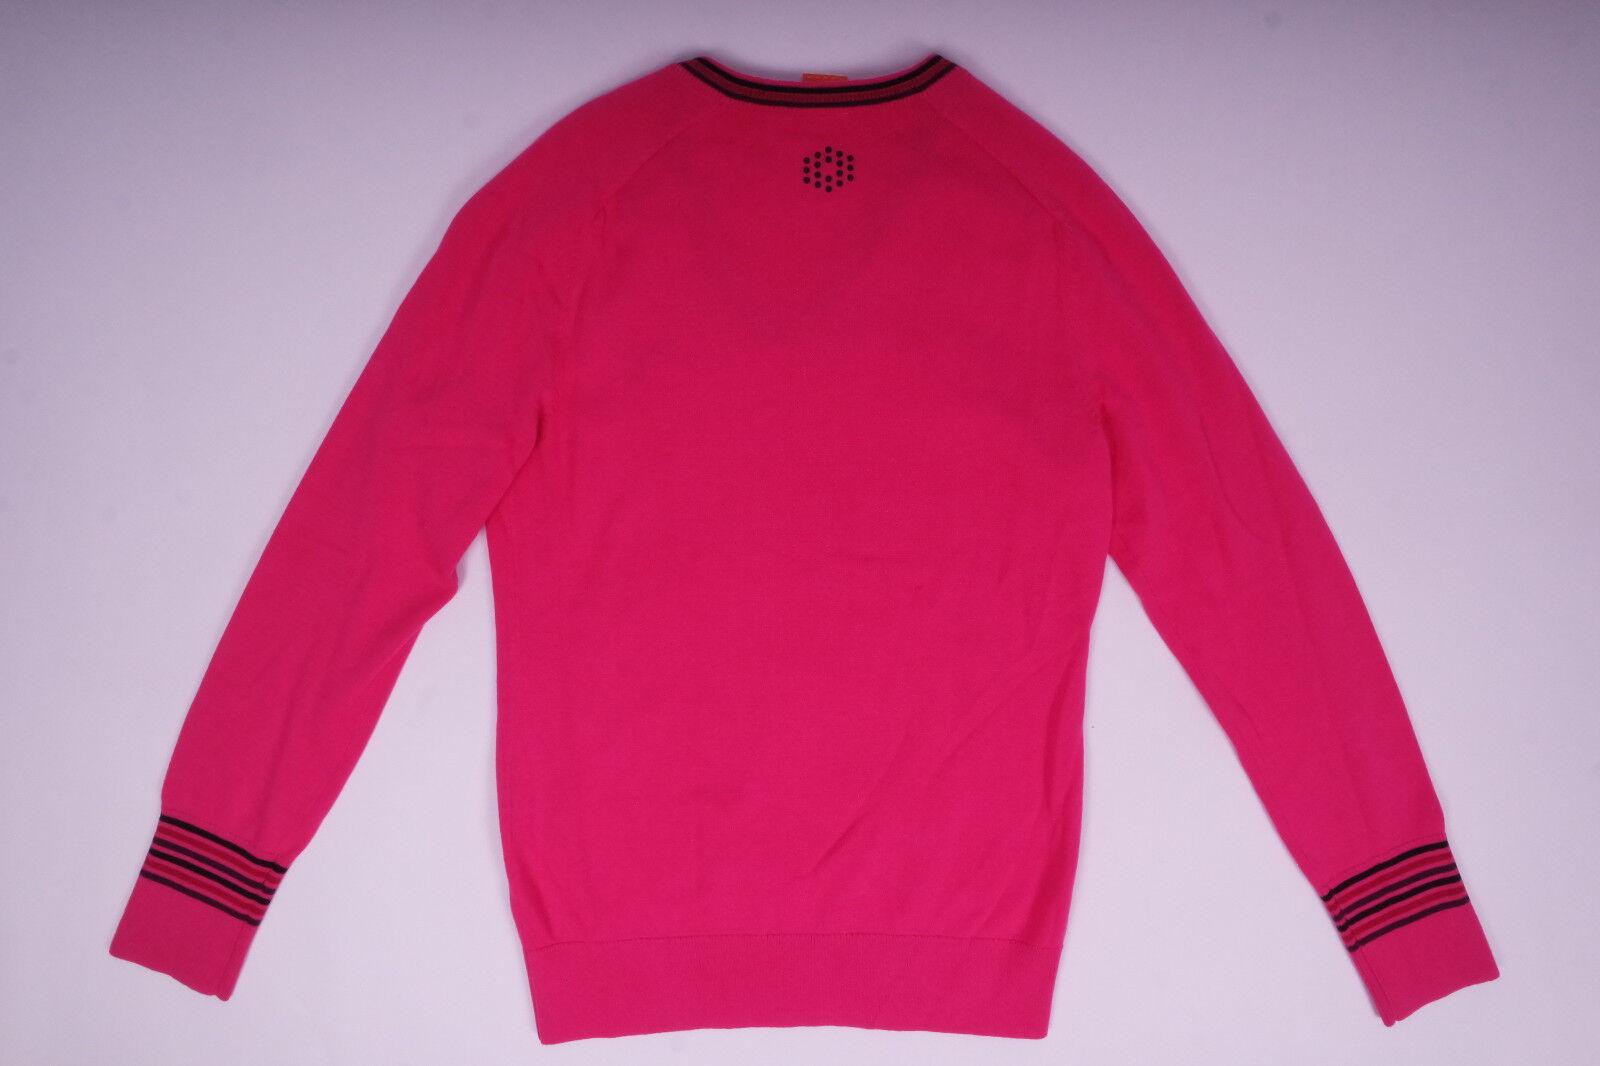 puma damen v neck pullover sweatshirt langarm rosa gr e s. Black Bedroom Furniture Sets. Home Design Ideas